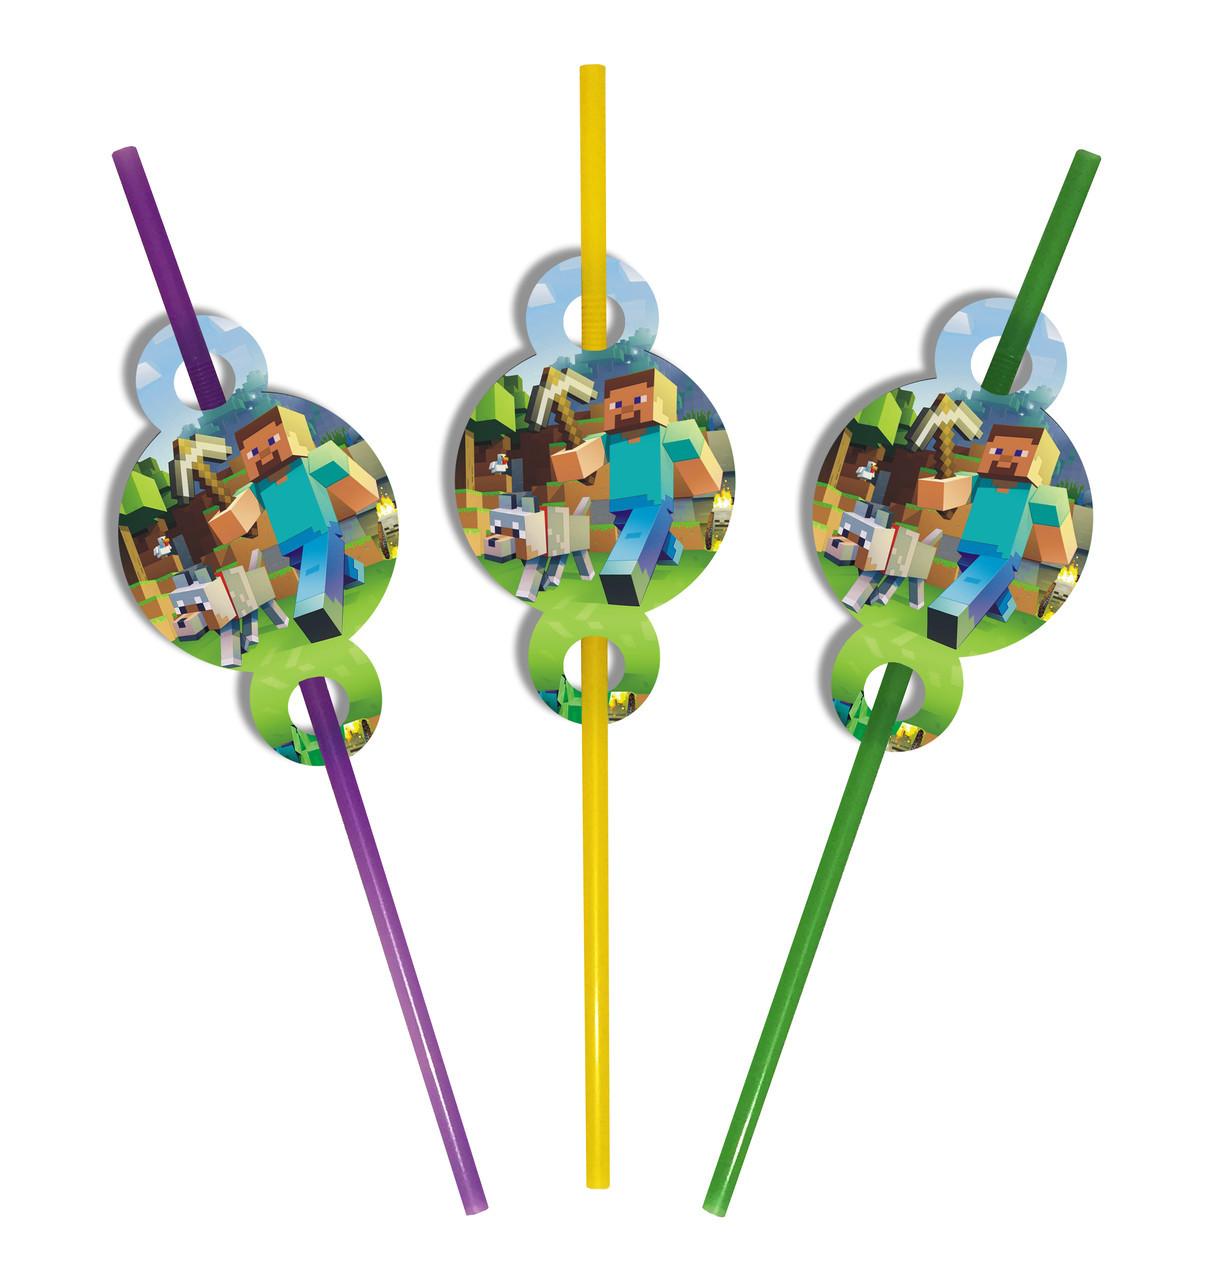 Трубочки для детского праздника в стиле Майнкрафт